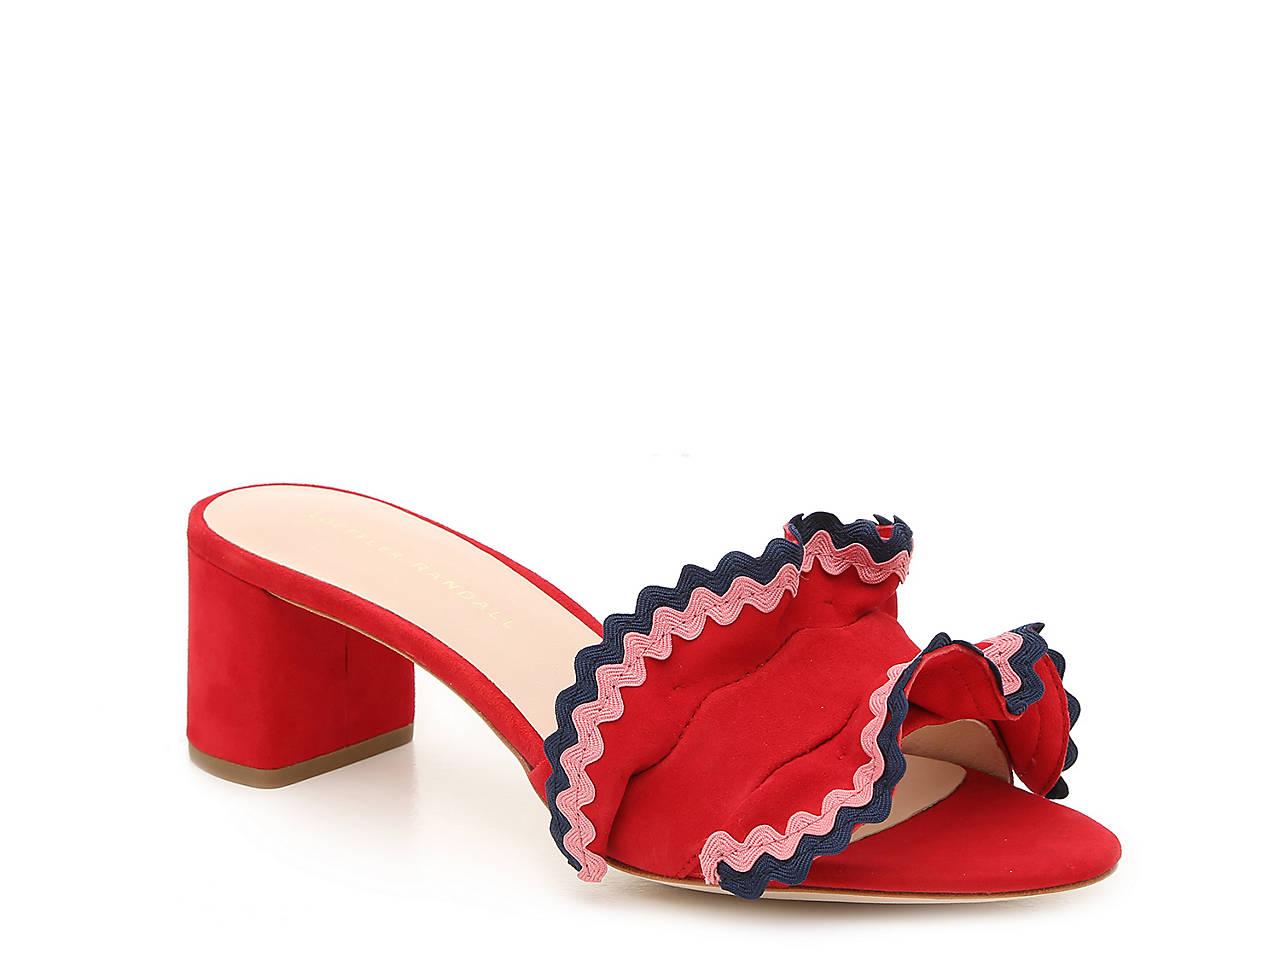 29f98cf901e06b Loeffler Randall Vera Sandal Women s Shoes